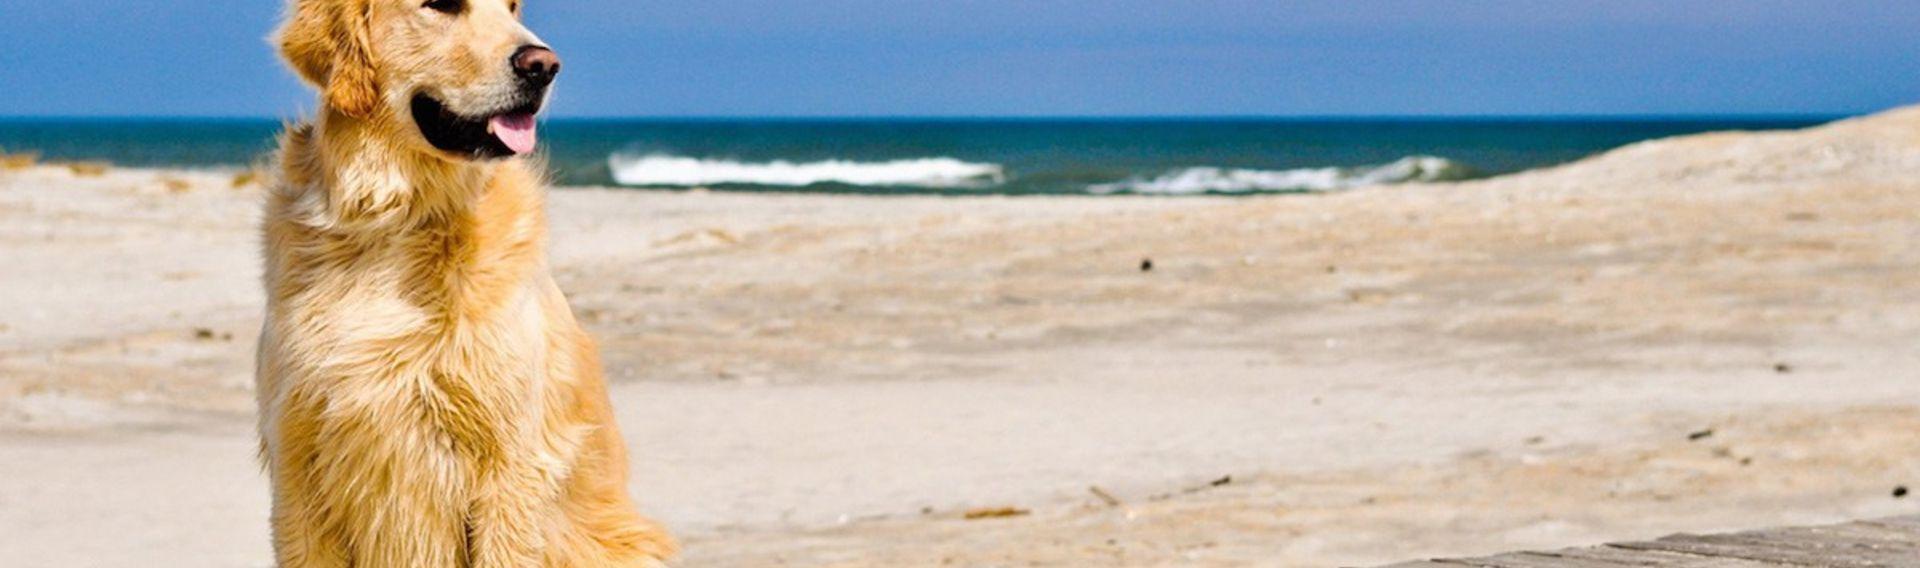 Hundestrände Insel Sylt List